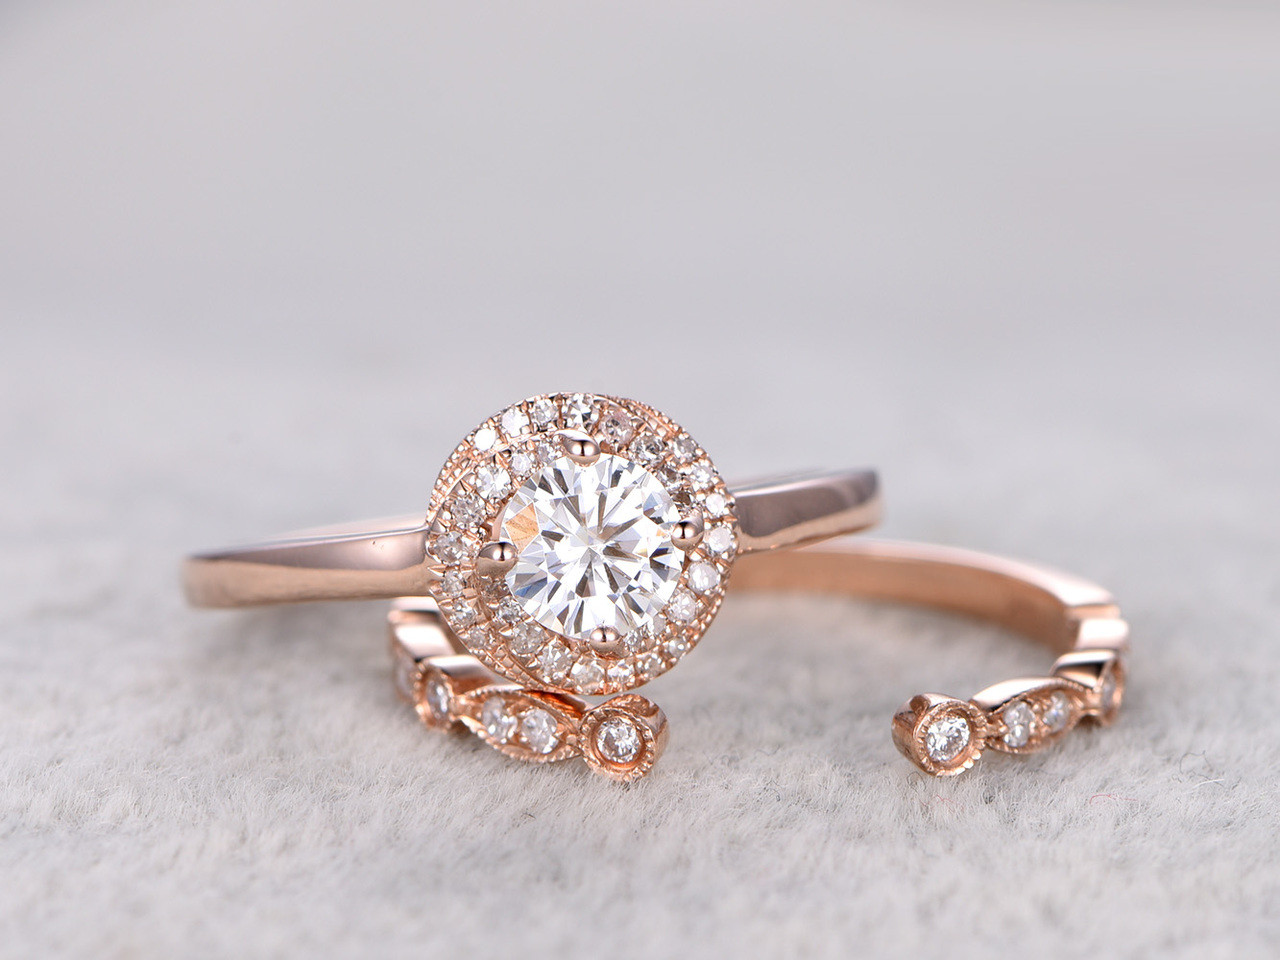 Moissanite engagement ring set Diamond Wedding Bands Rose Gold Open